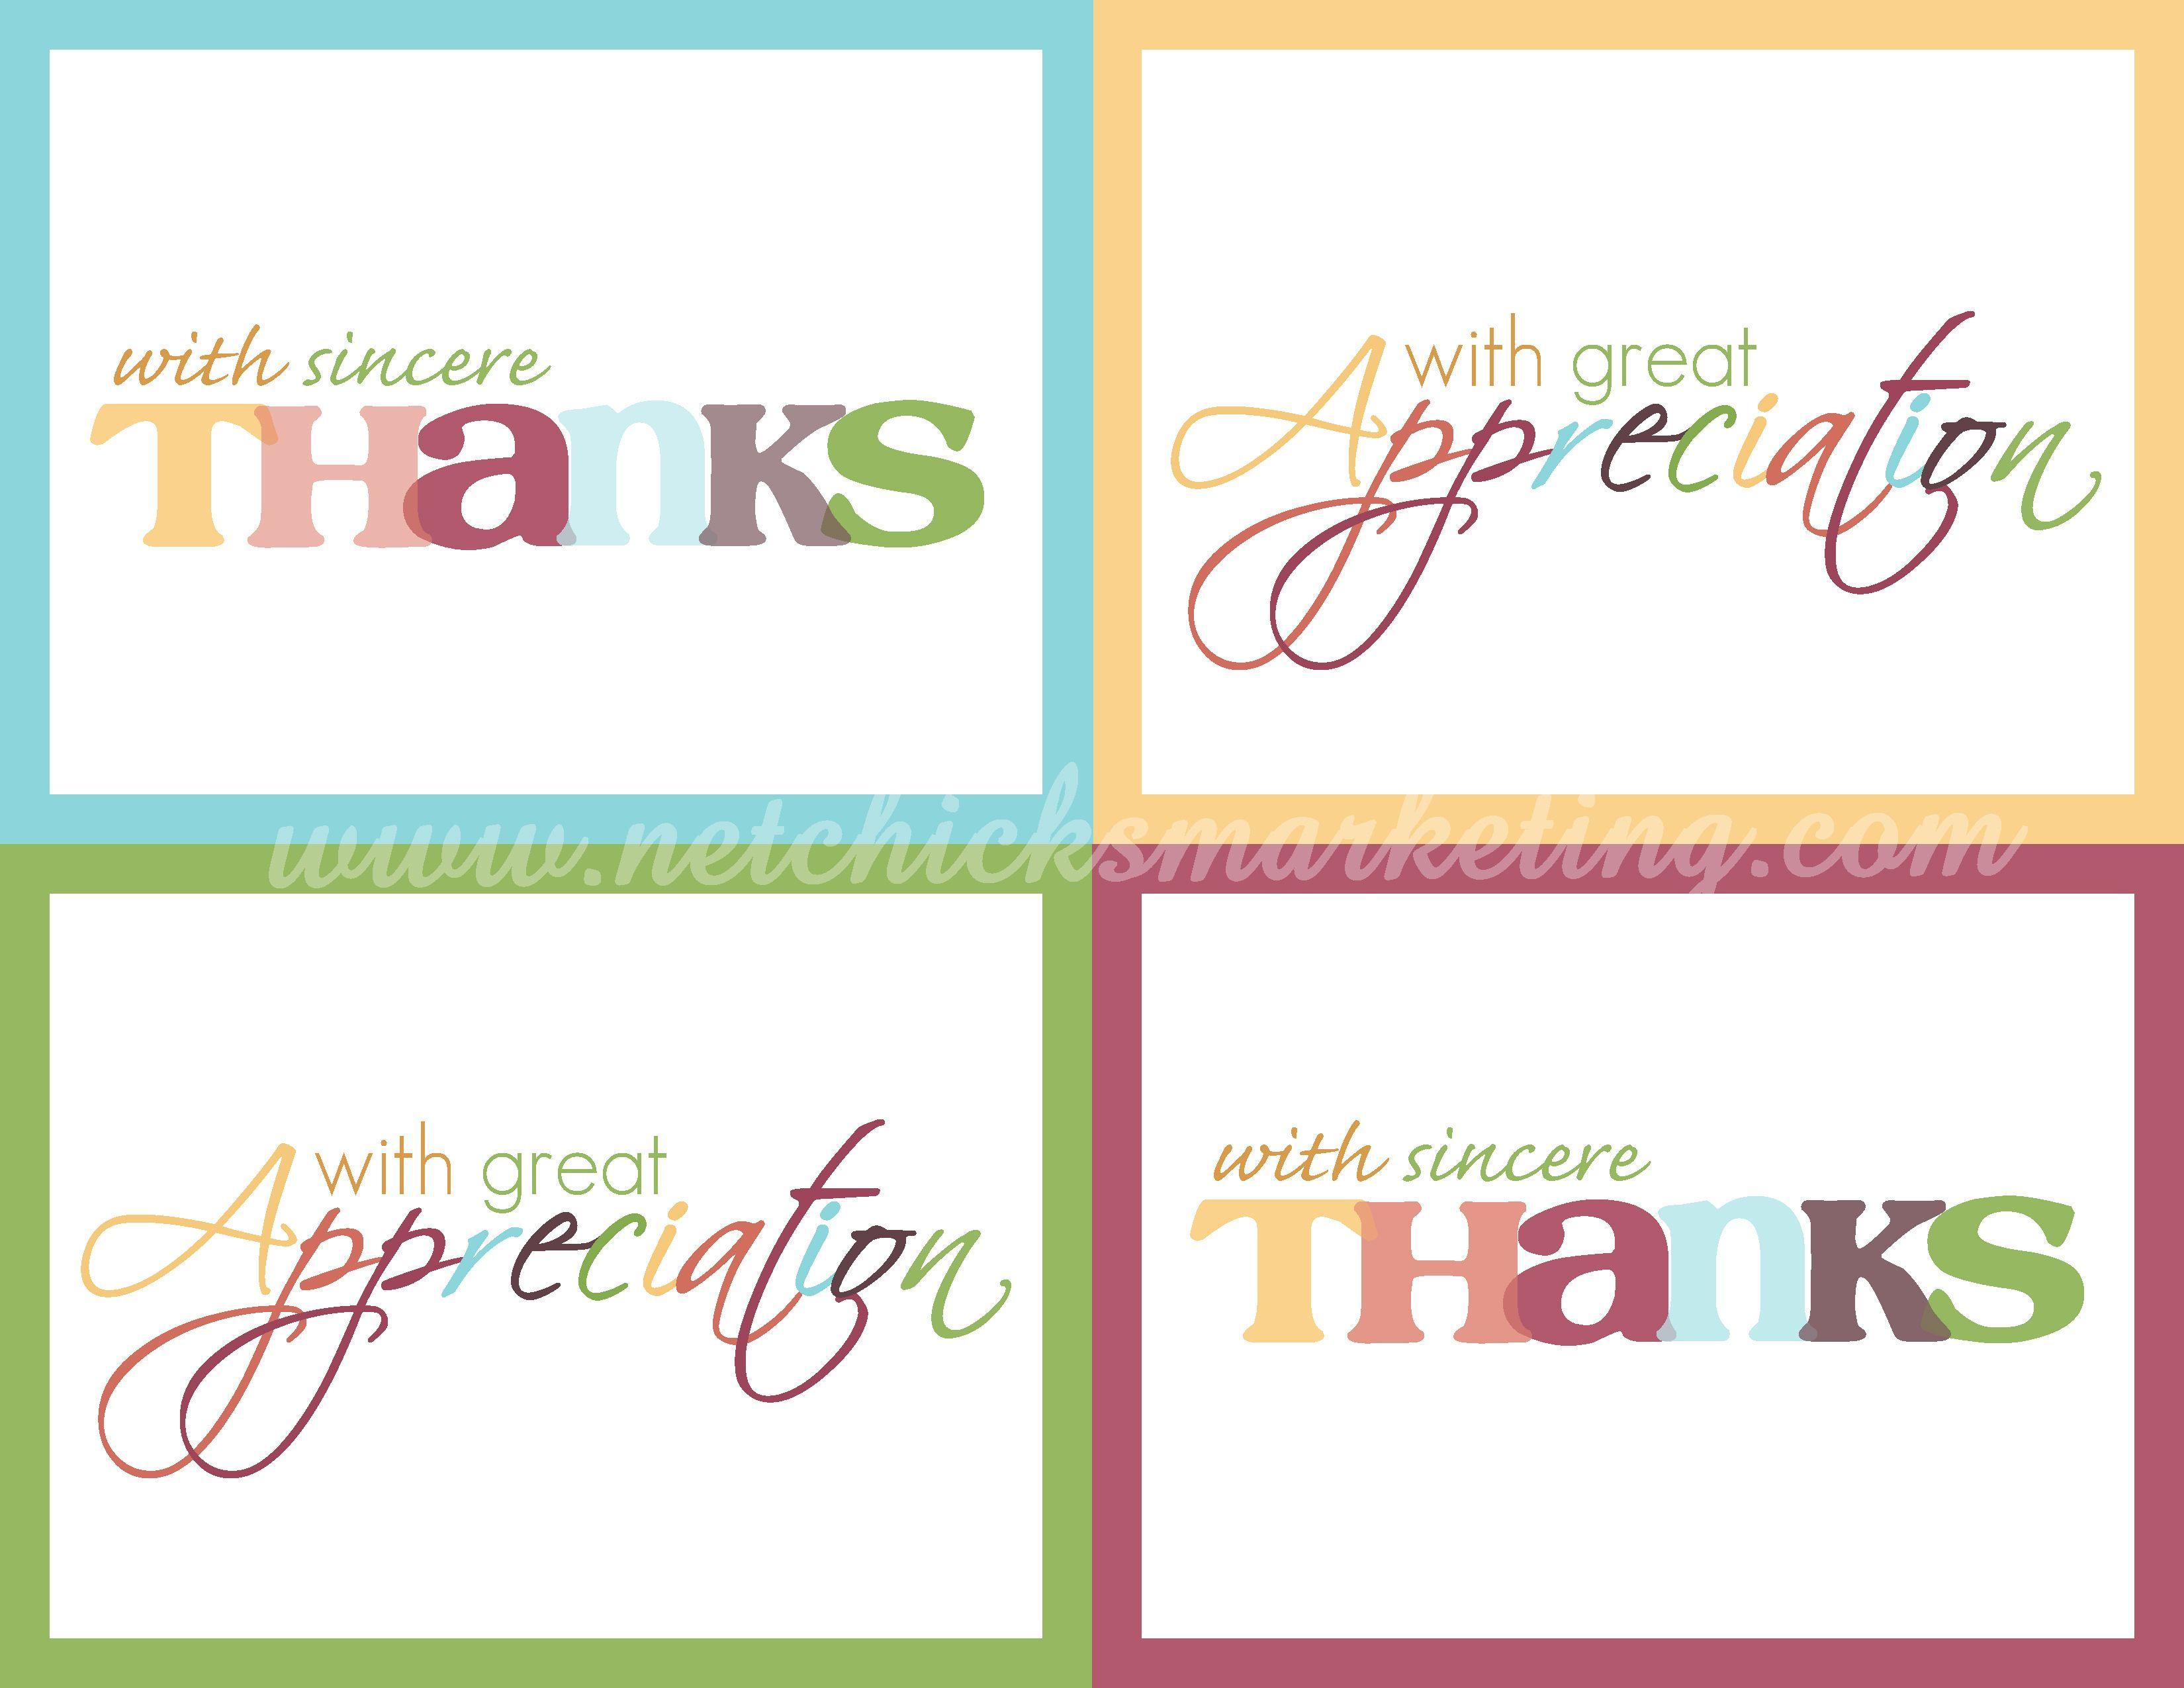 Image Result For Postcards Free Printable | Cards | Printable Thank - Thank You Card Free Printable Template